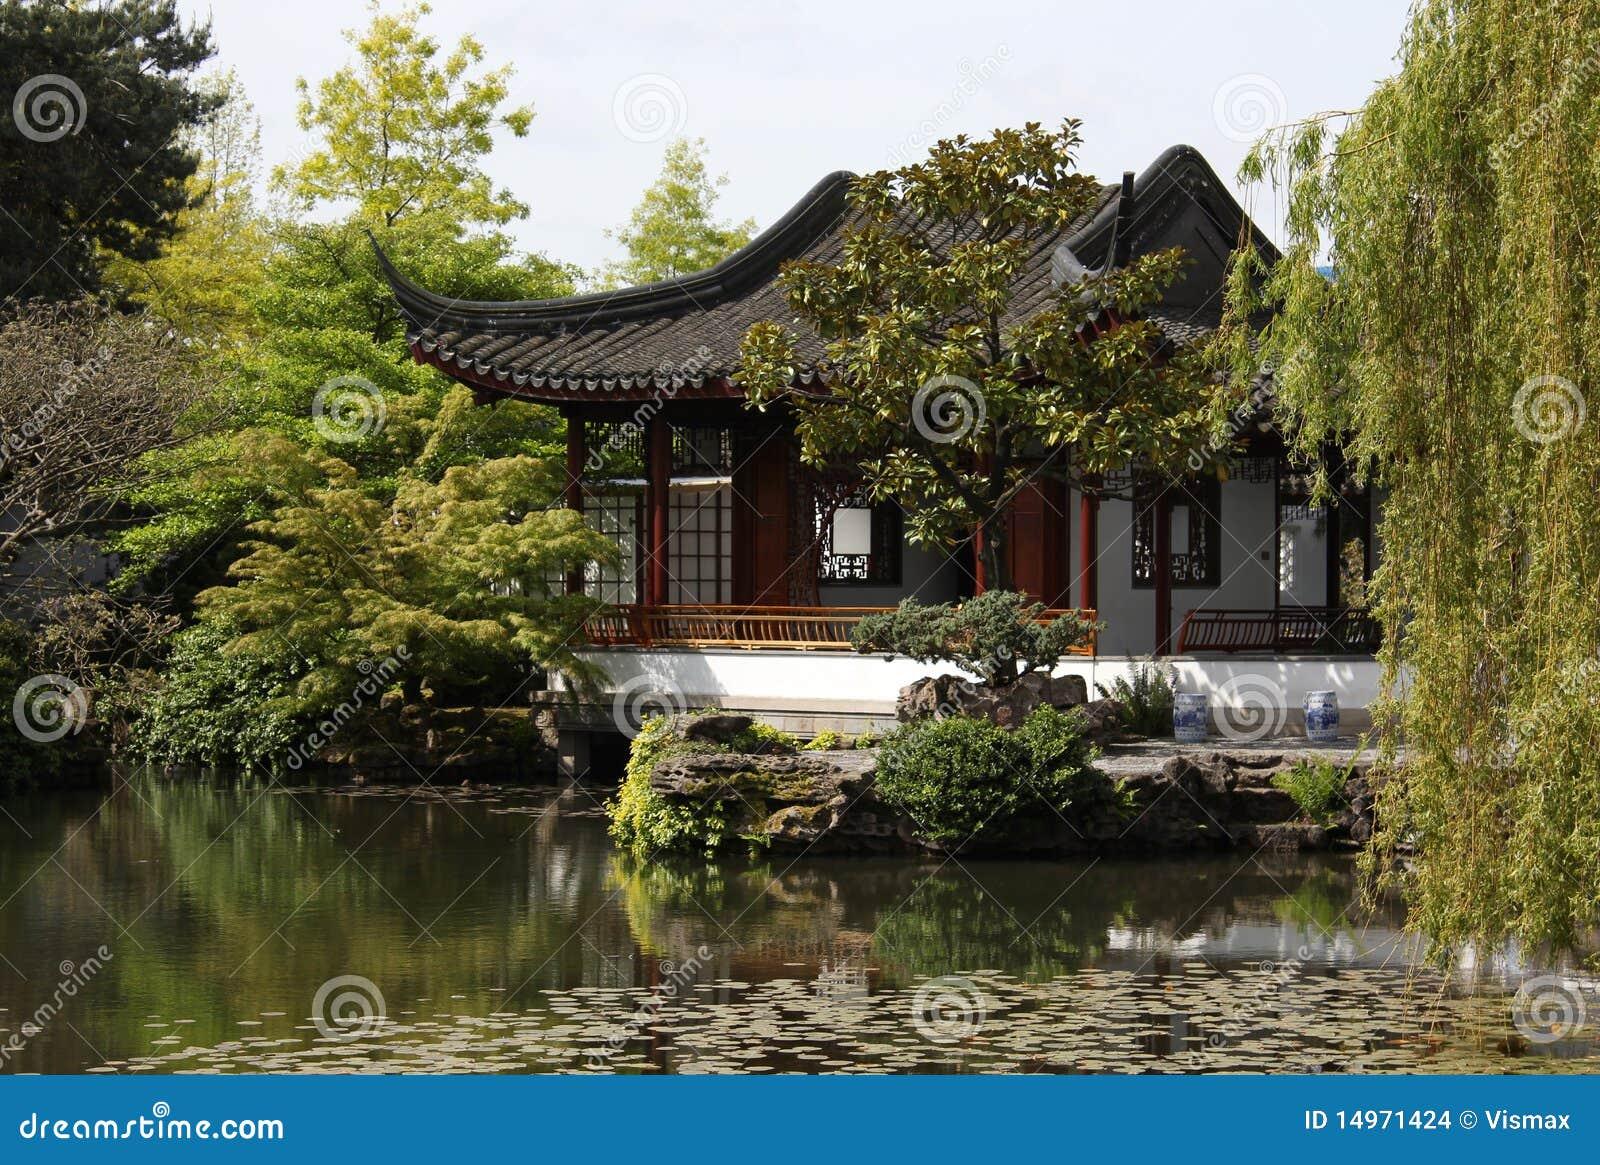 Sun Yat Sen Gardens In Vancouver Stock Photo - Image of asia, water ...